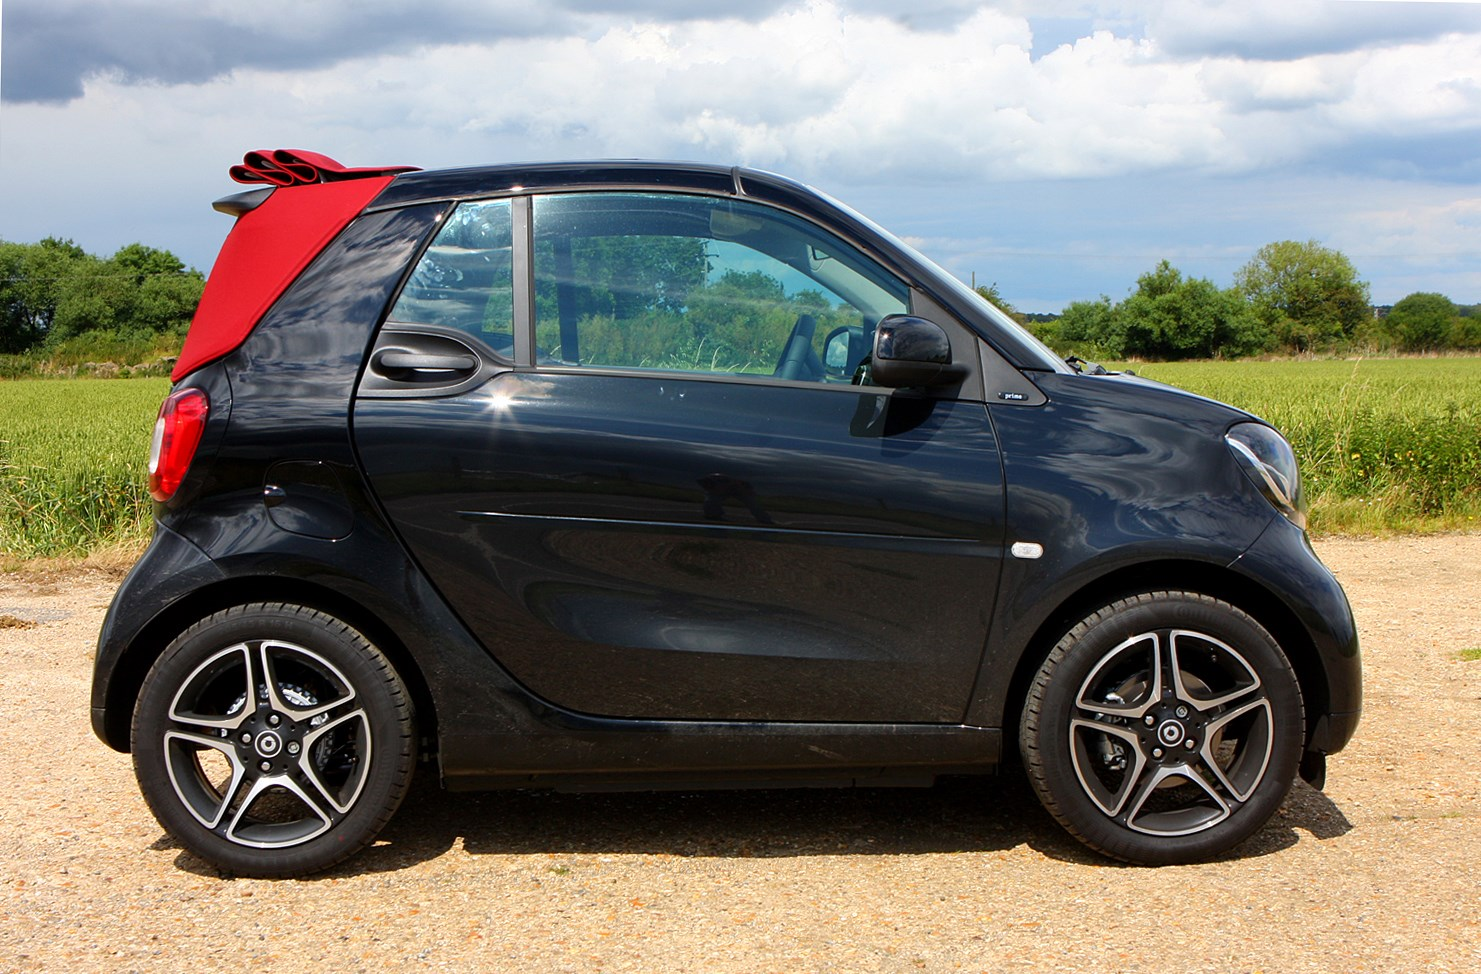 smart fortwo cabriolet review 2016 parkers. Black Bedroom Furniture Sets. Home Design Ideas